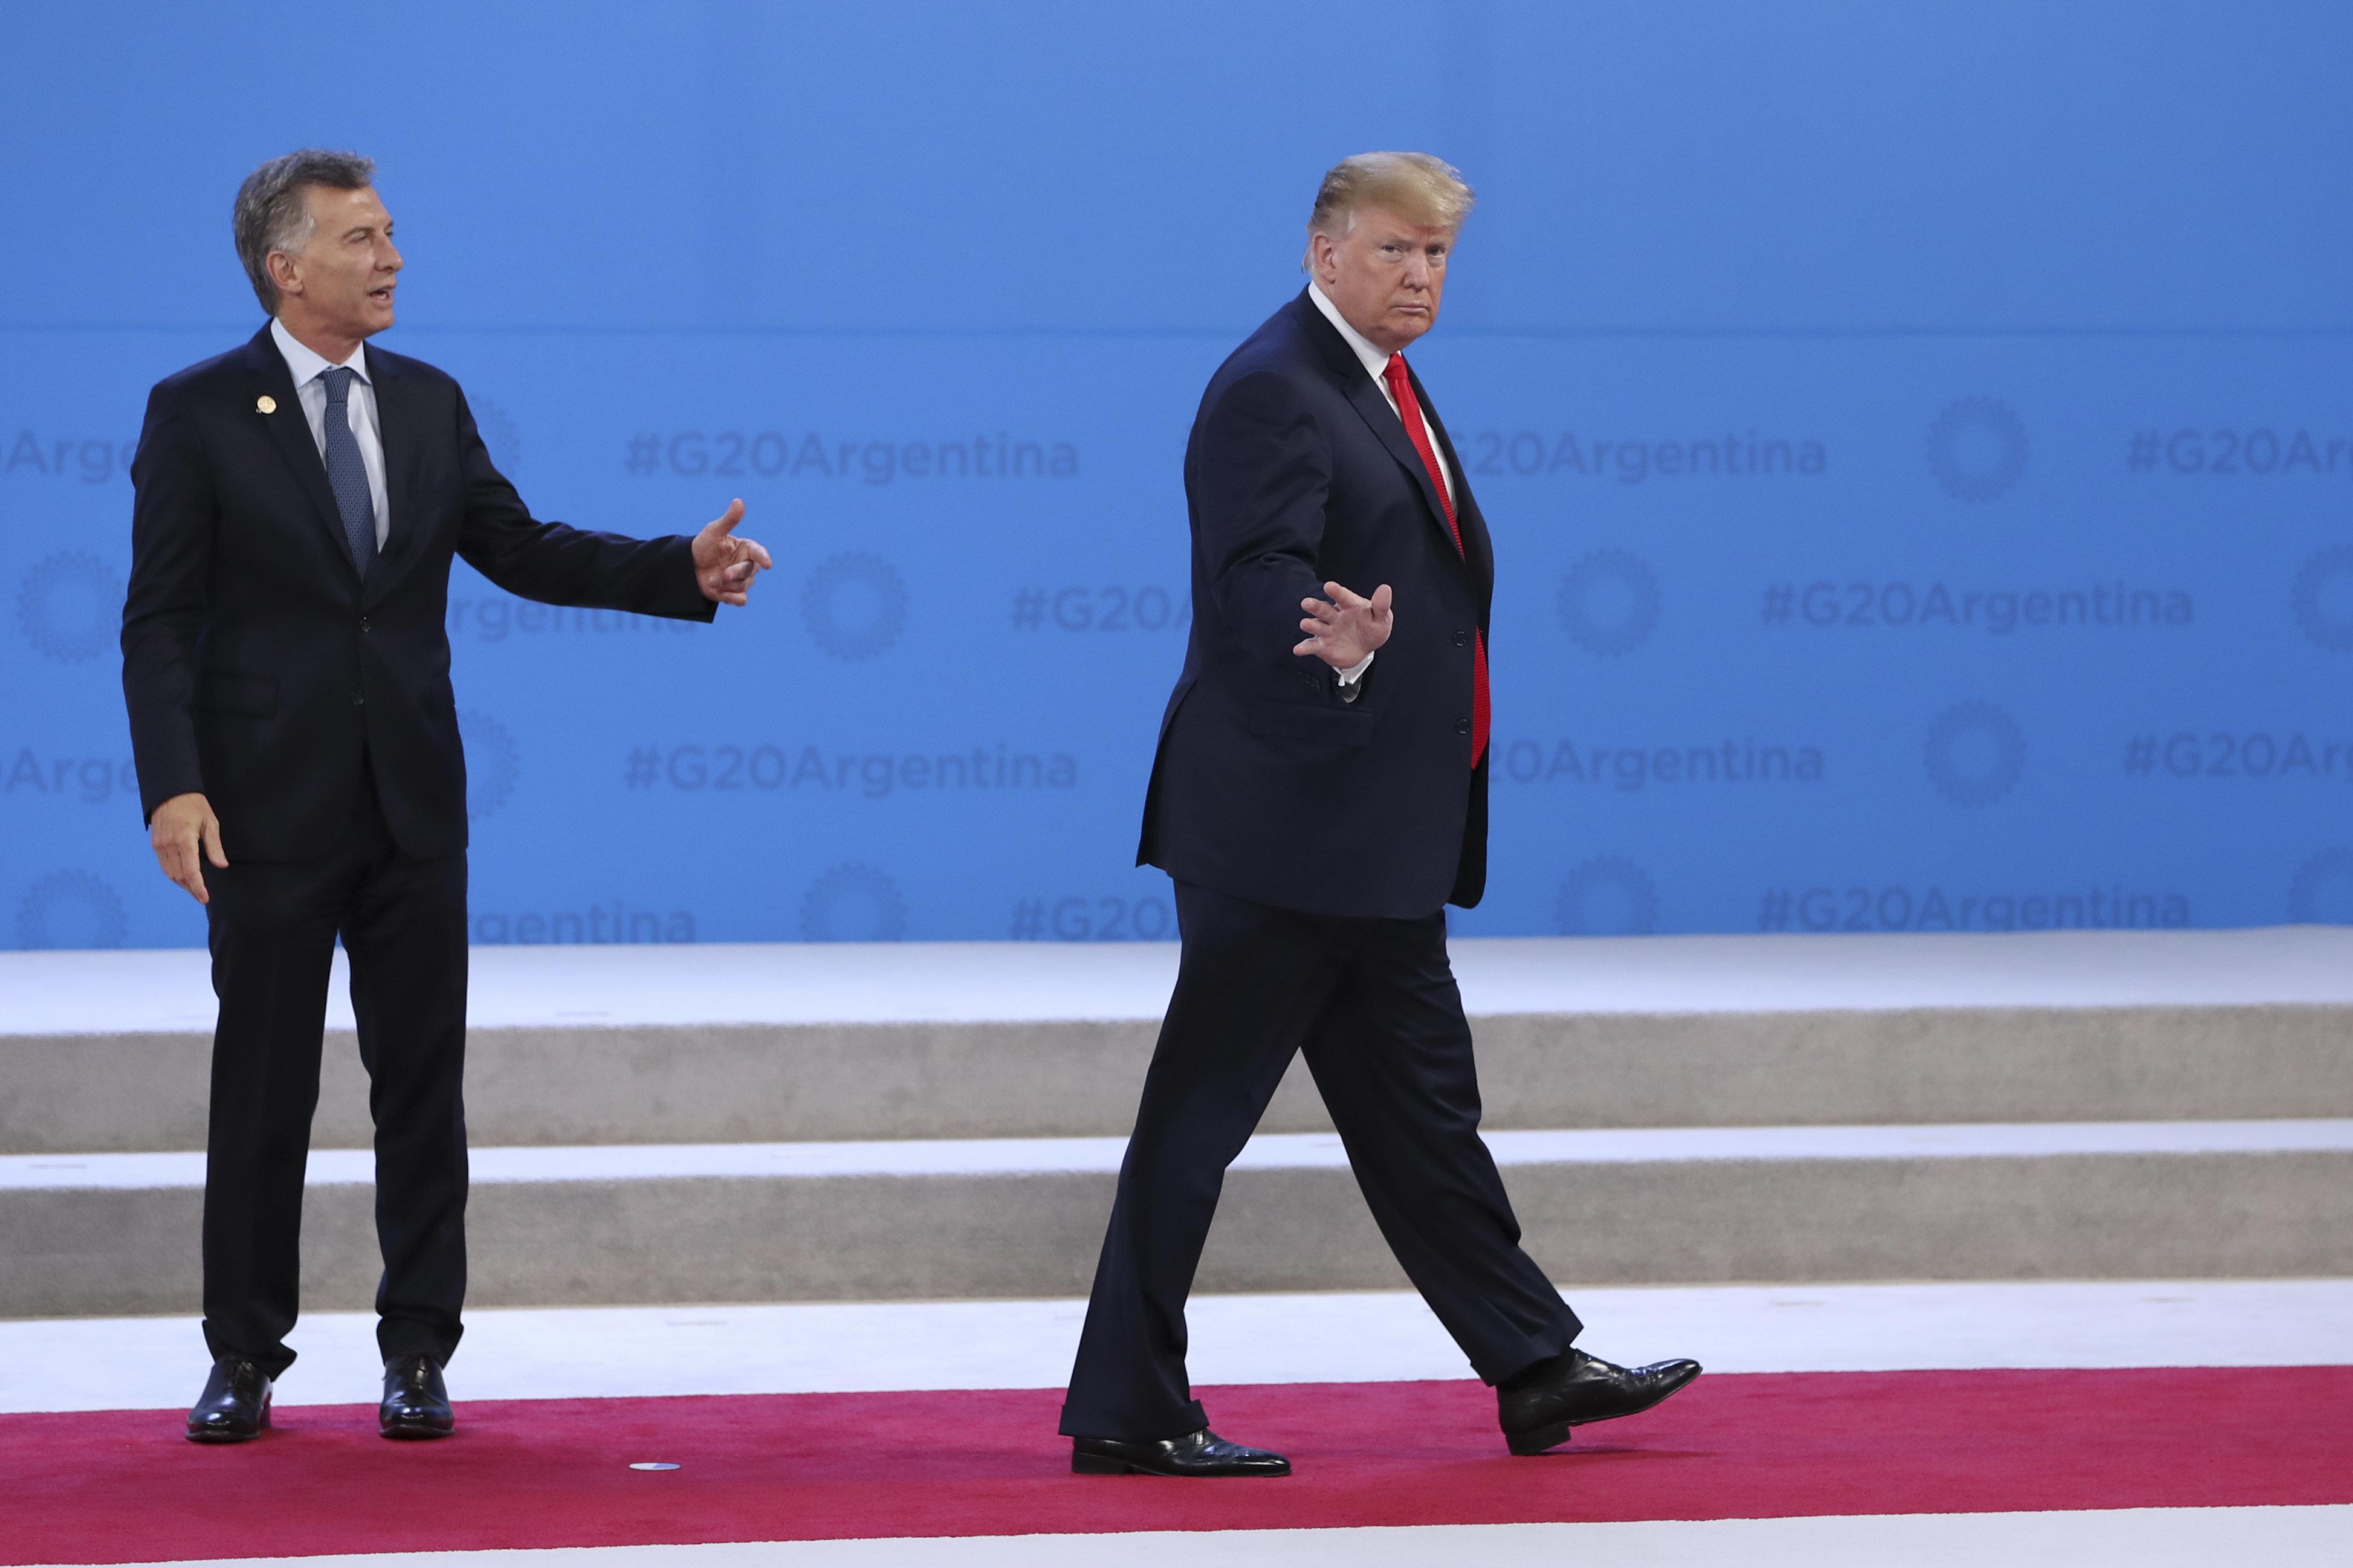 Hilarious Supercut Shows Donald Trump Wandering Off During Important